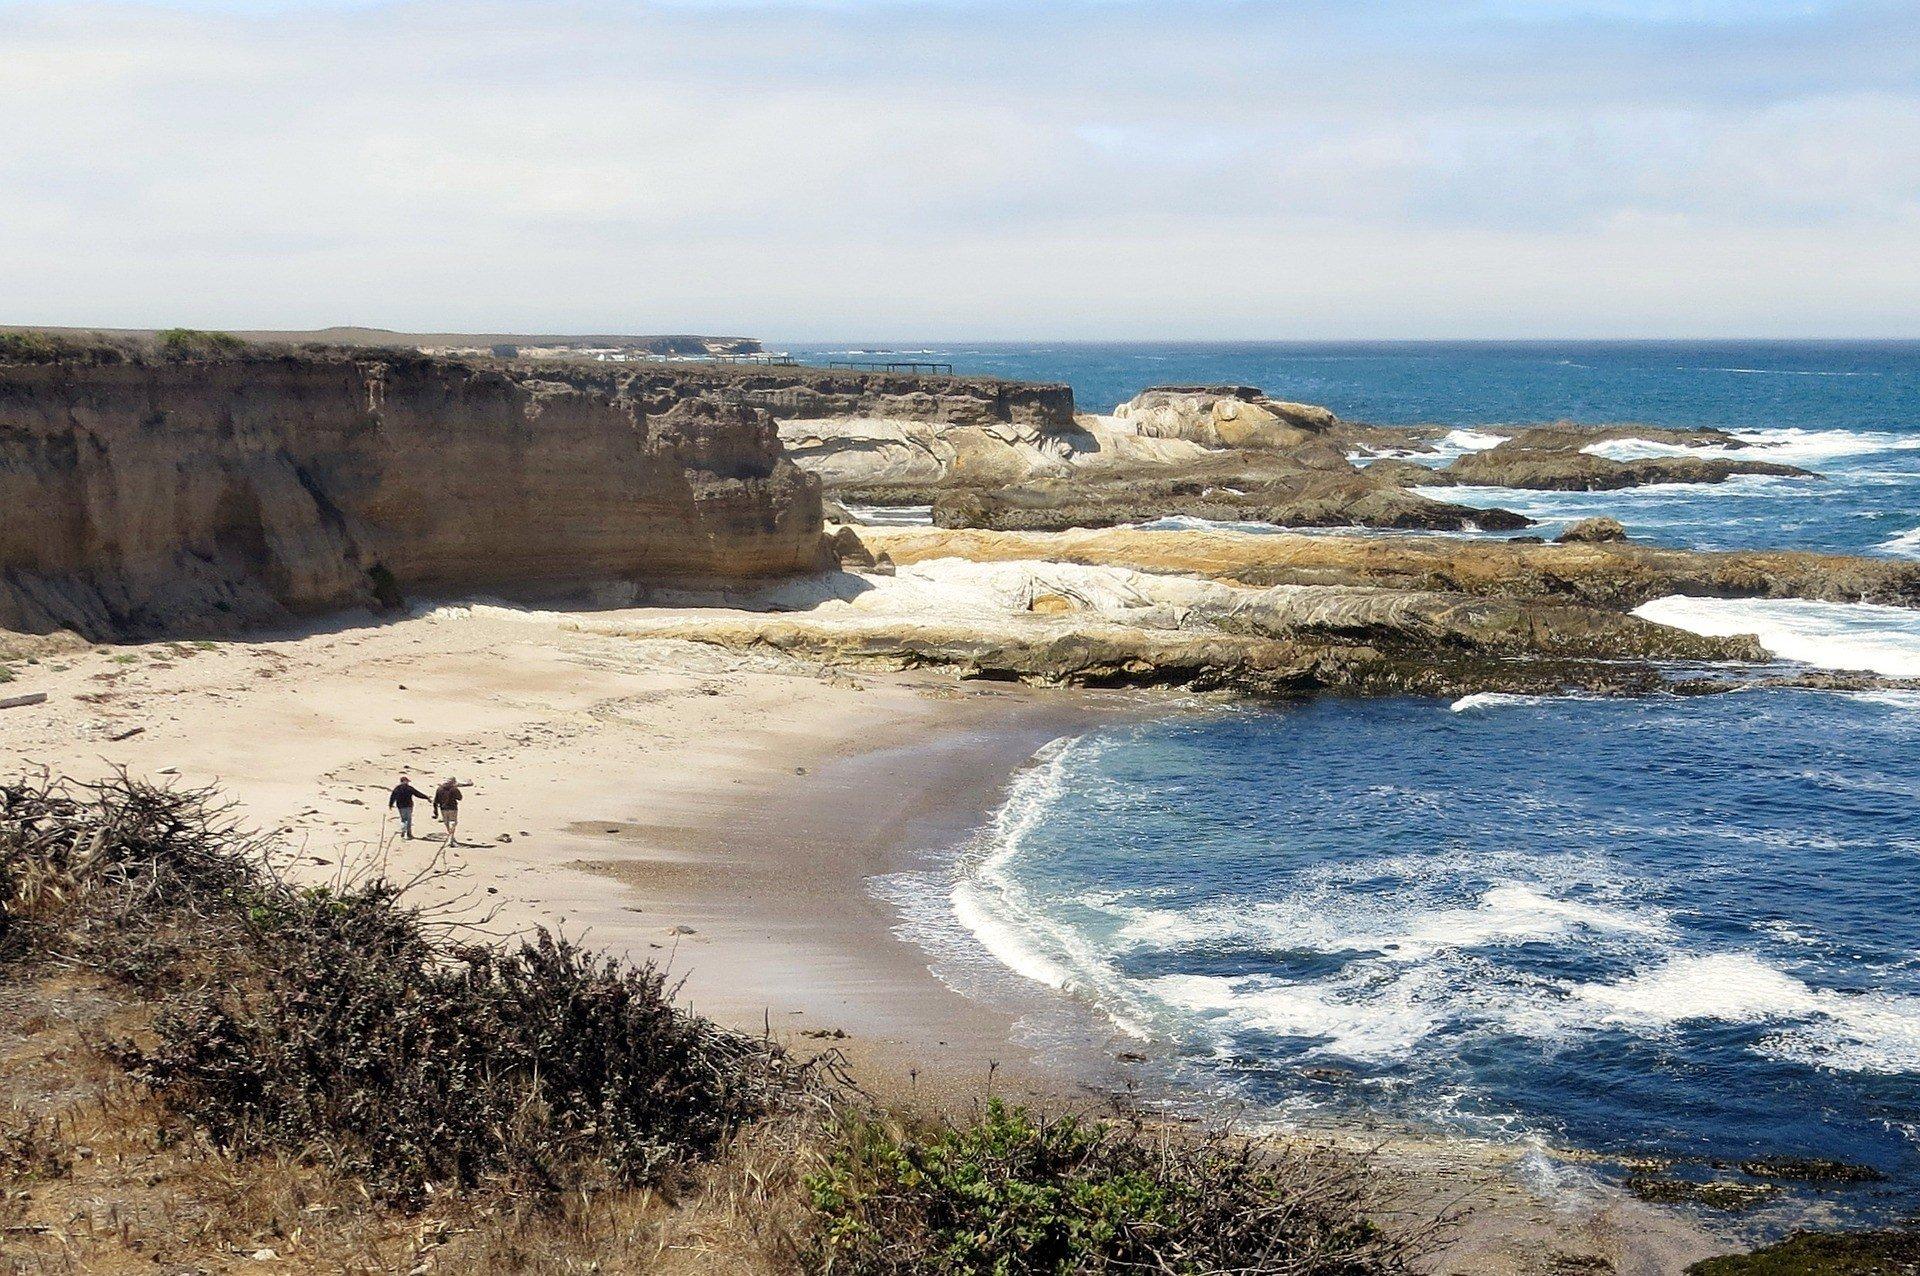 San Luis Obispo Beach in California